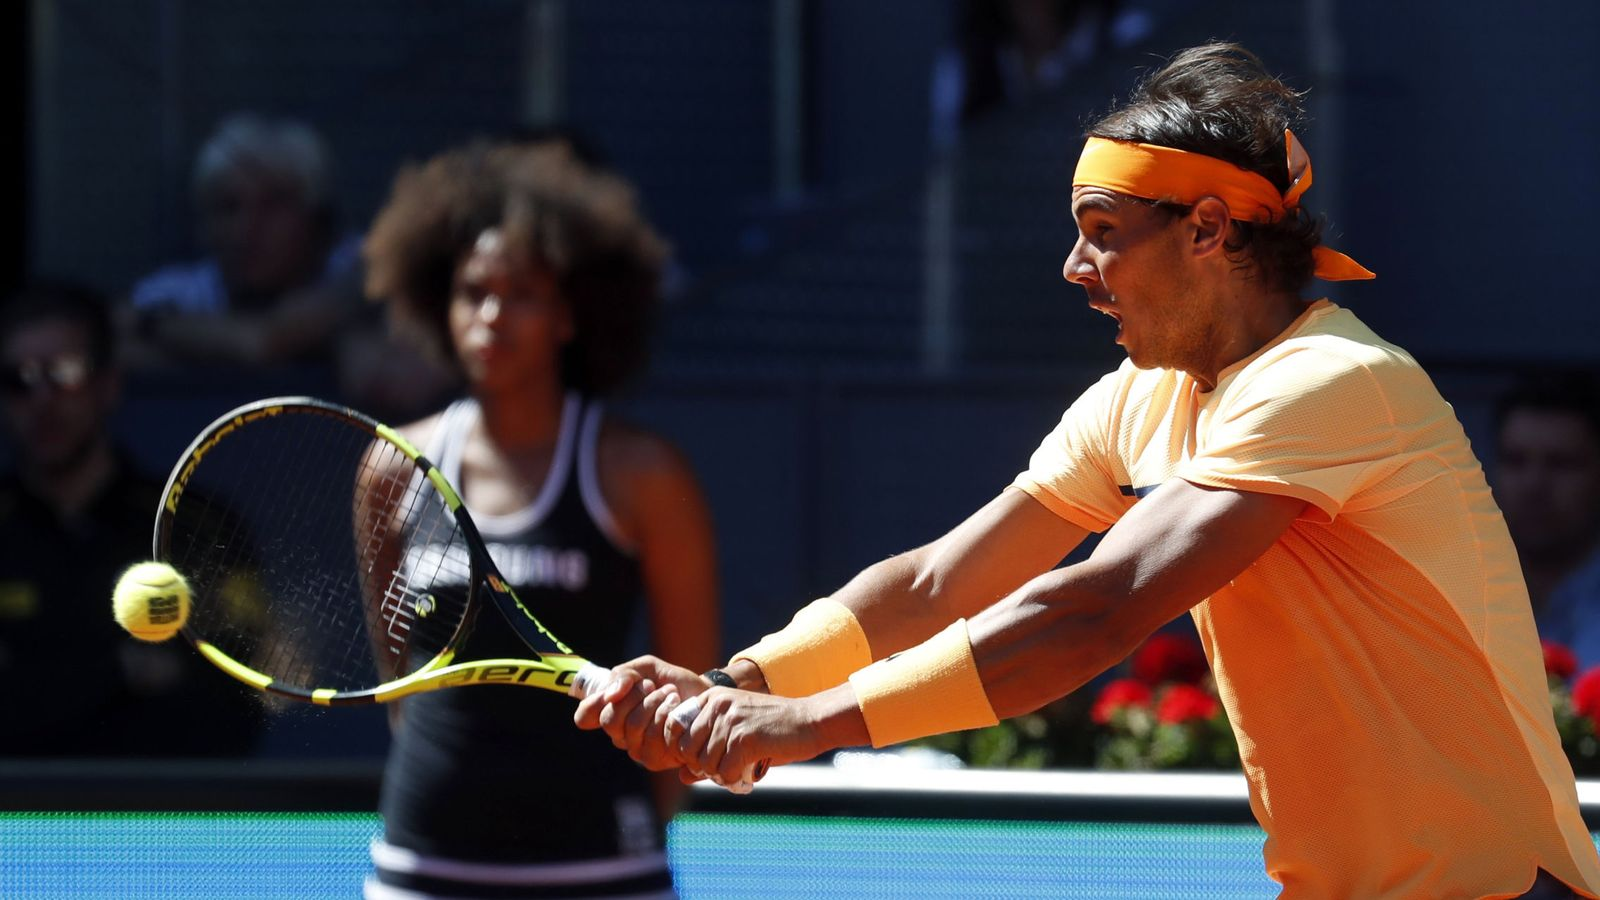 Foto: Rafa Nadal golpea ante Kuznetsov (EFE)